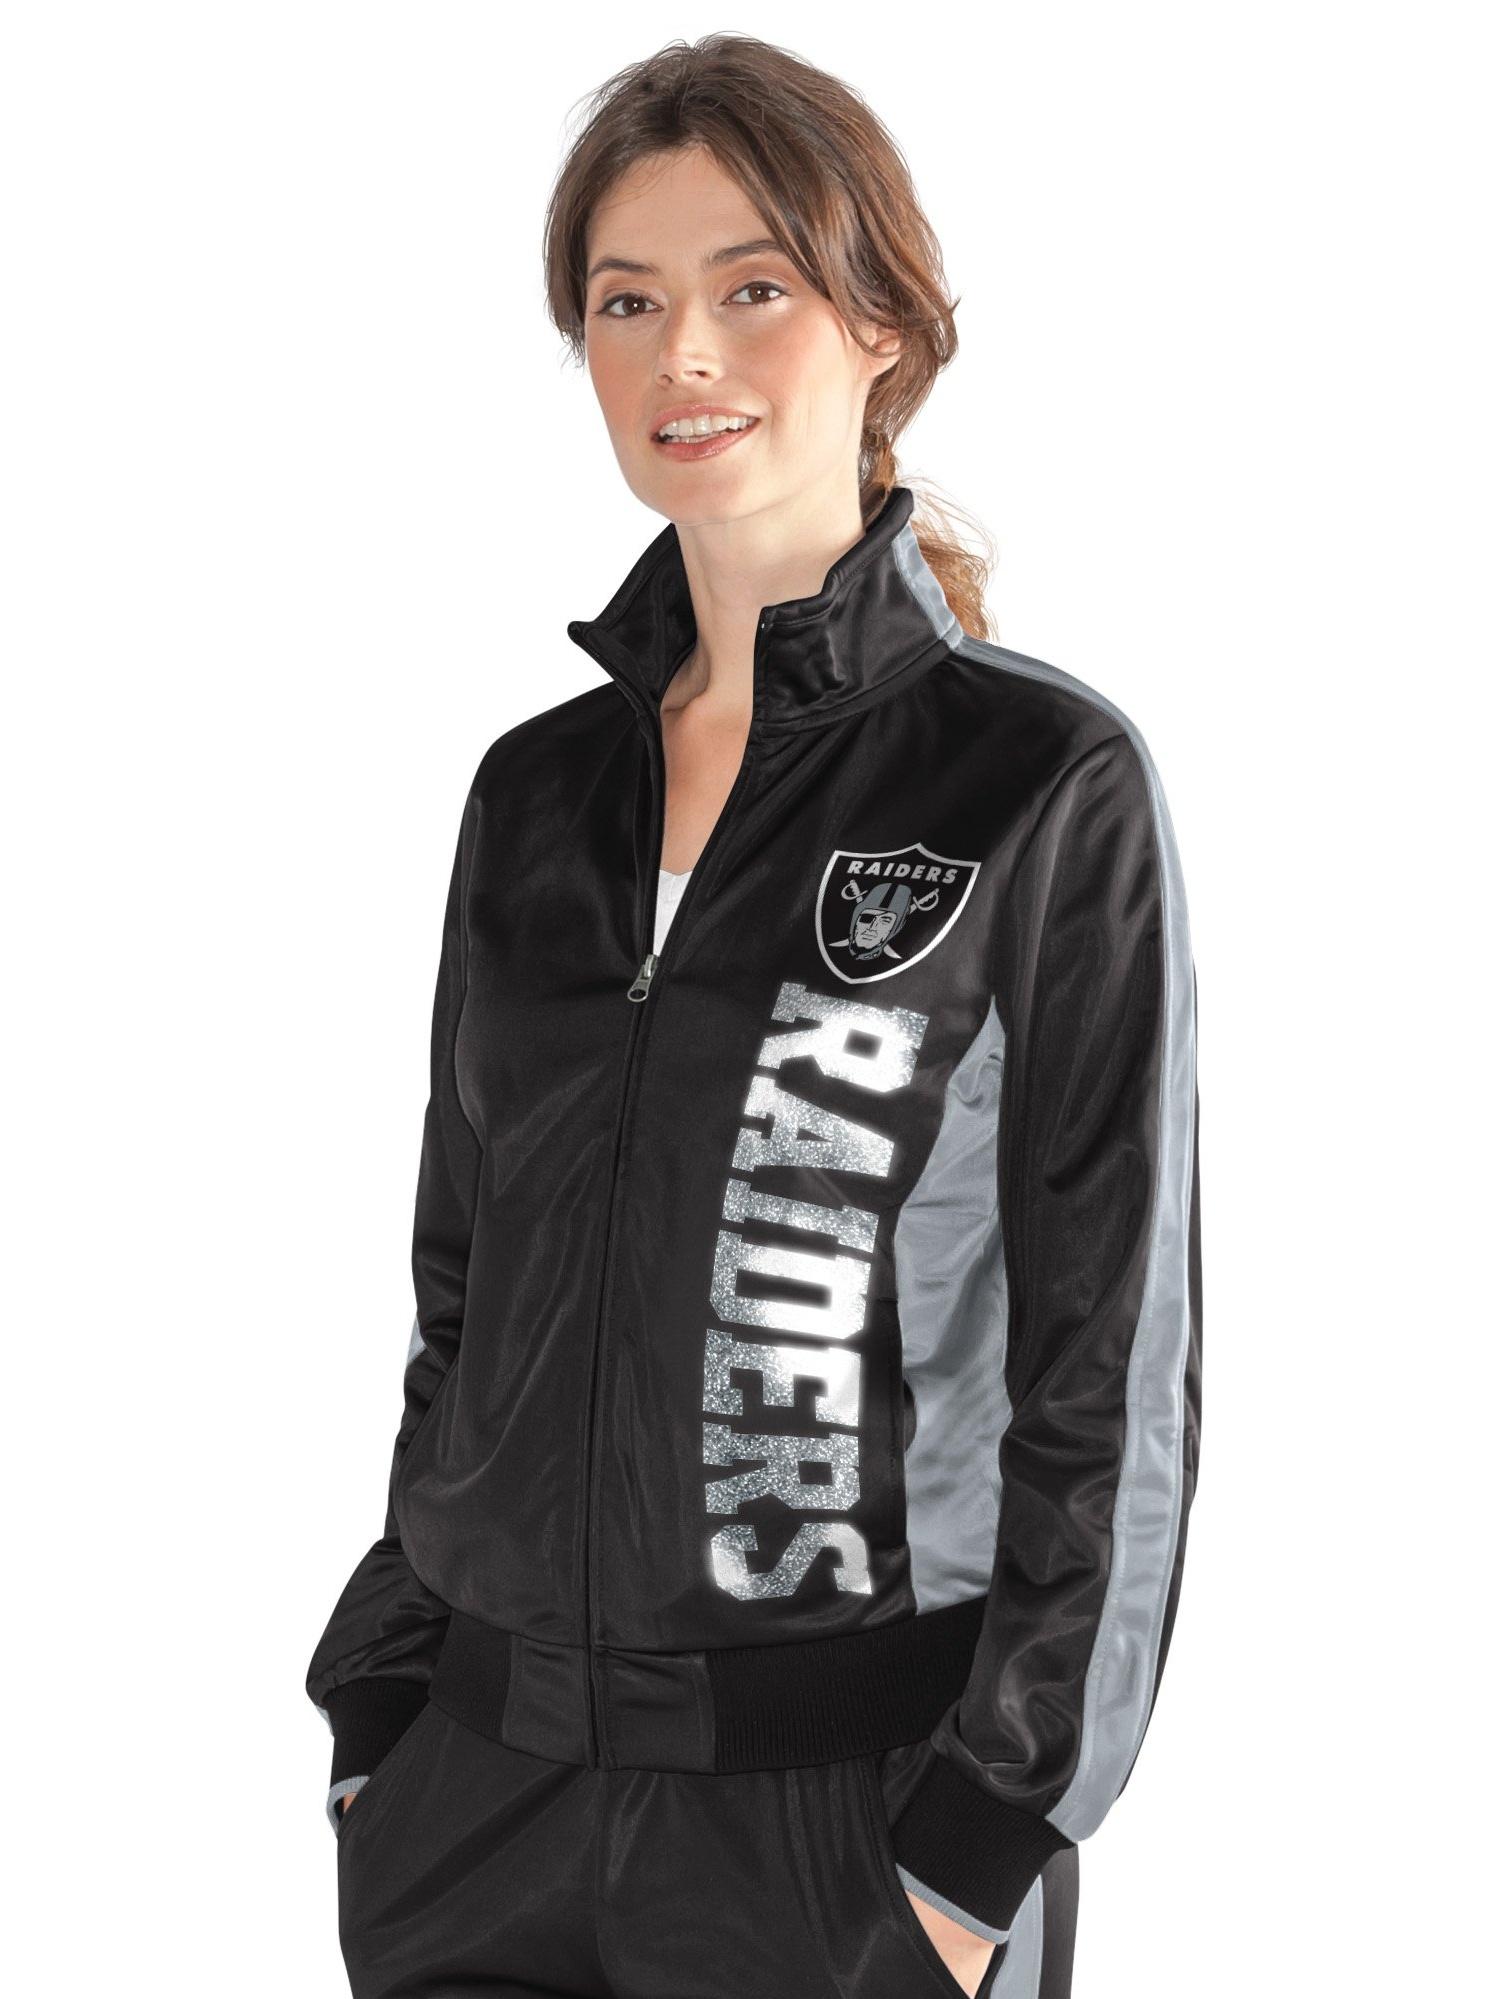 Oakland Raiders Women's Black Silver MVP Full-Zip Track Jacket by G-III 4Her by Carl Banks